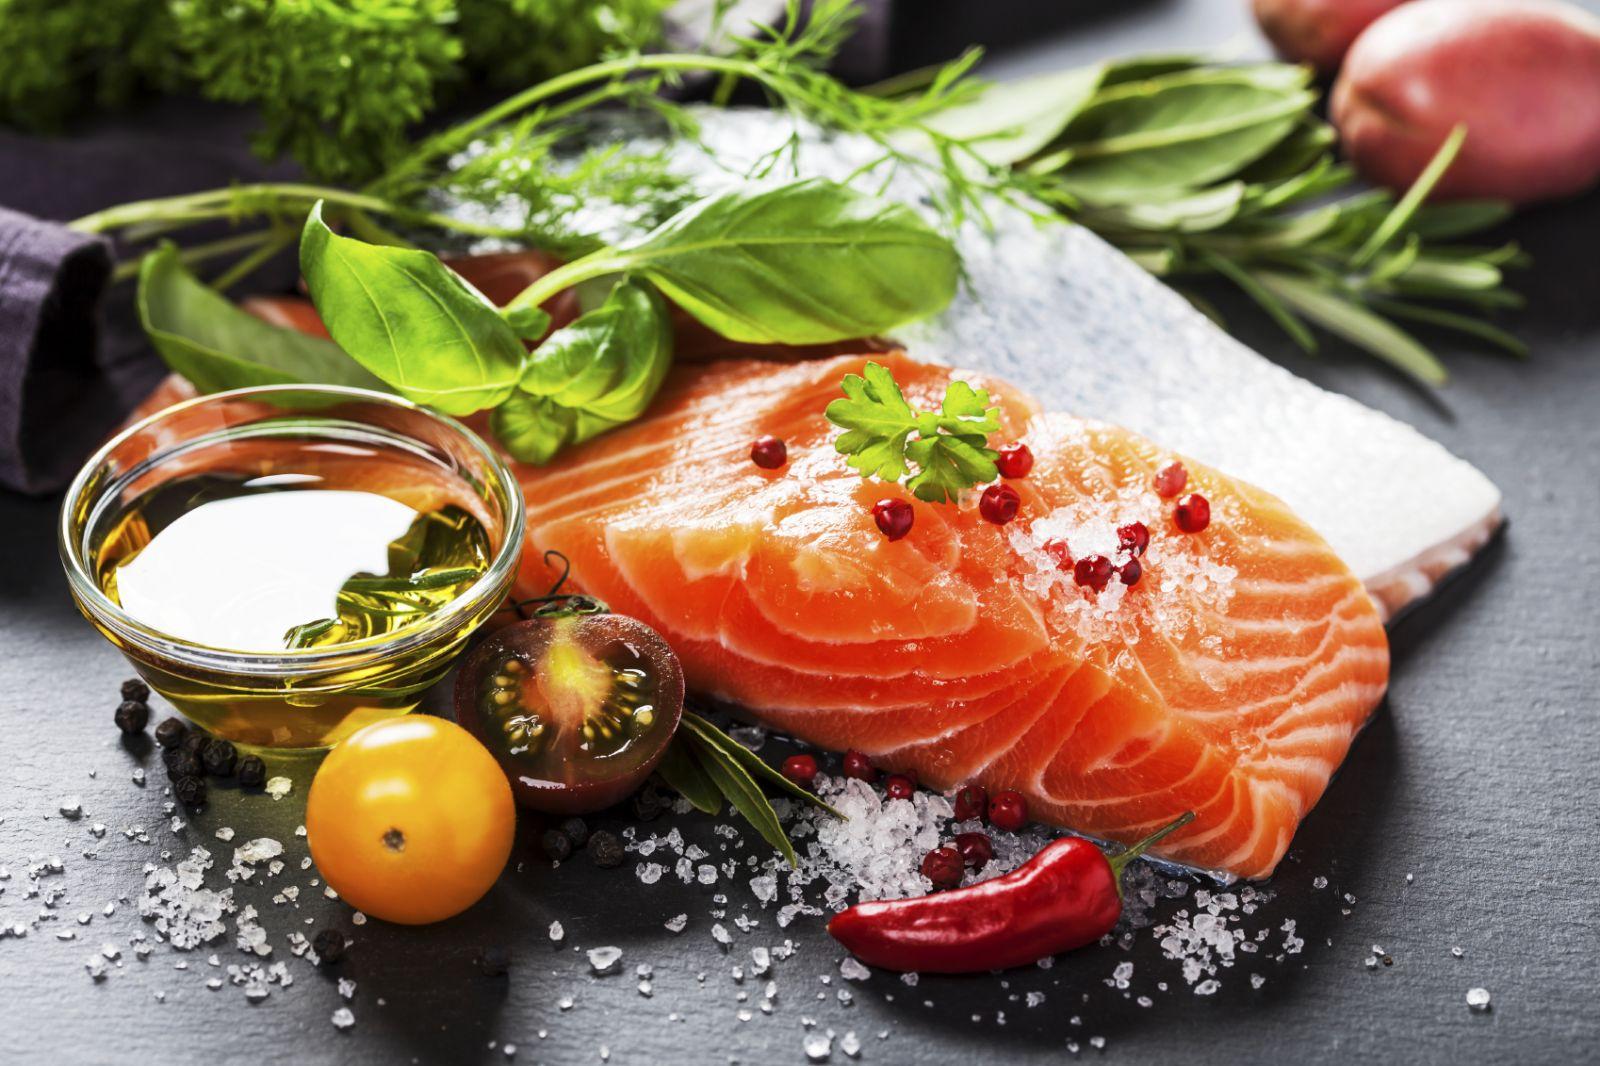 Mediterranean Diet Beats Low-Fat For Heart Health in Big New Study